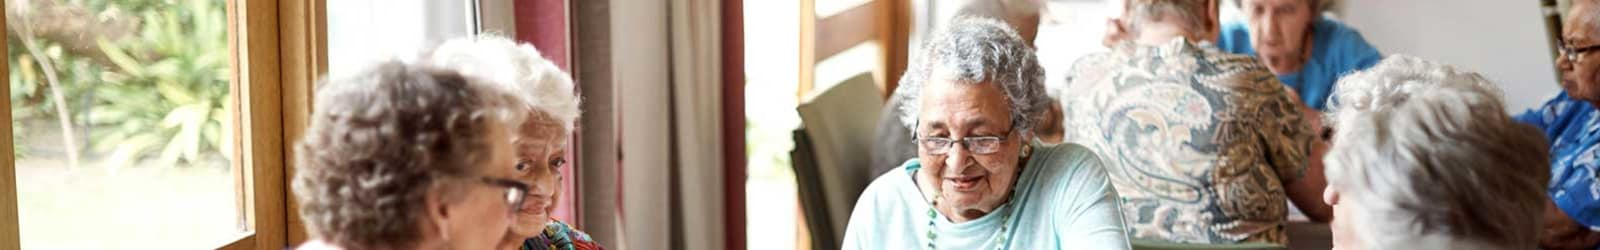 Reviews of senior living in South Carolina